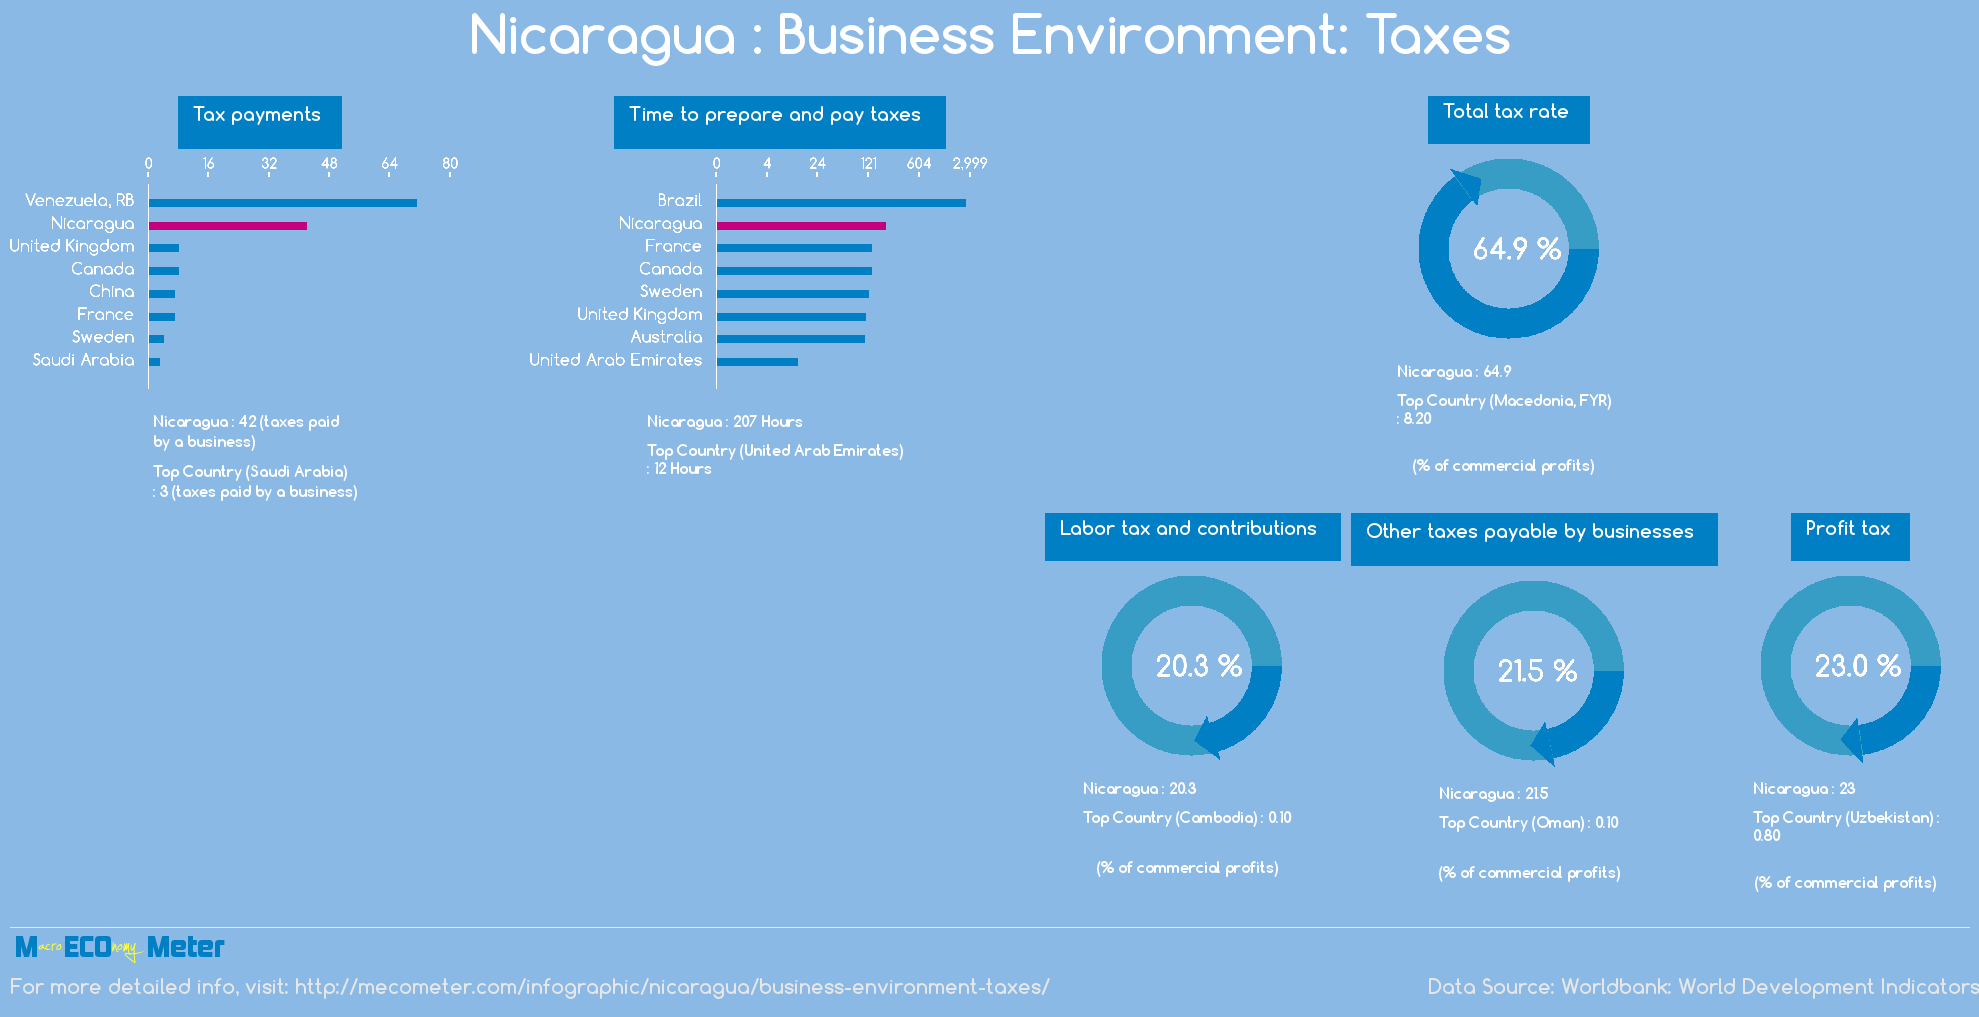 Nicaragua : Business Environment: Taxes